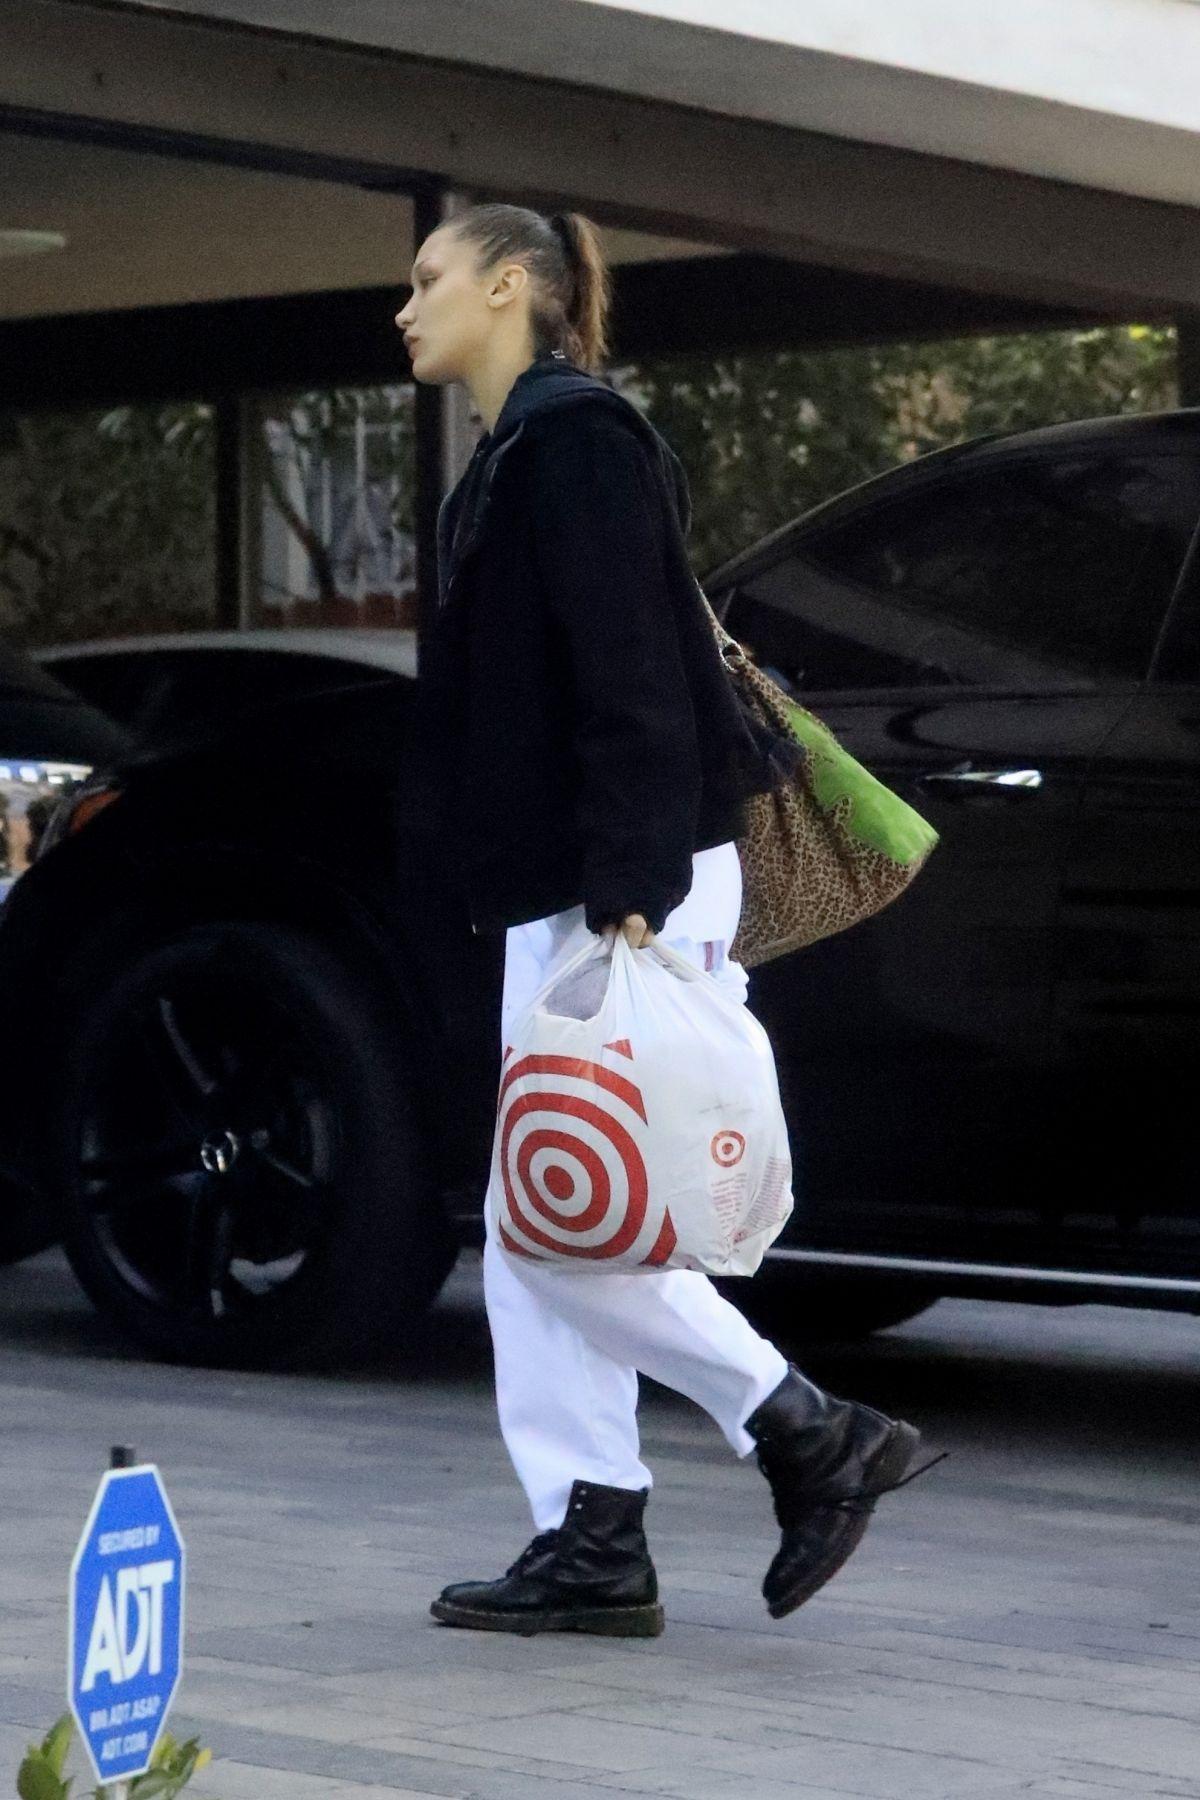 Bella Hadid Shopping at Target in Los Angeles 03/30/2020. #bellahadid #bellahadidstyle #celebrity #fashion #celebrityfashion #celebritystyle #celebritystreetstyle #streetstyle #streetfashion #models